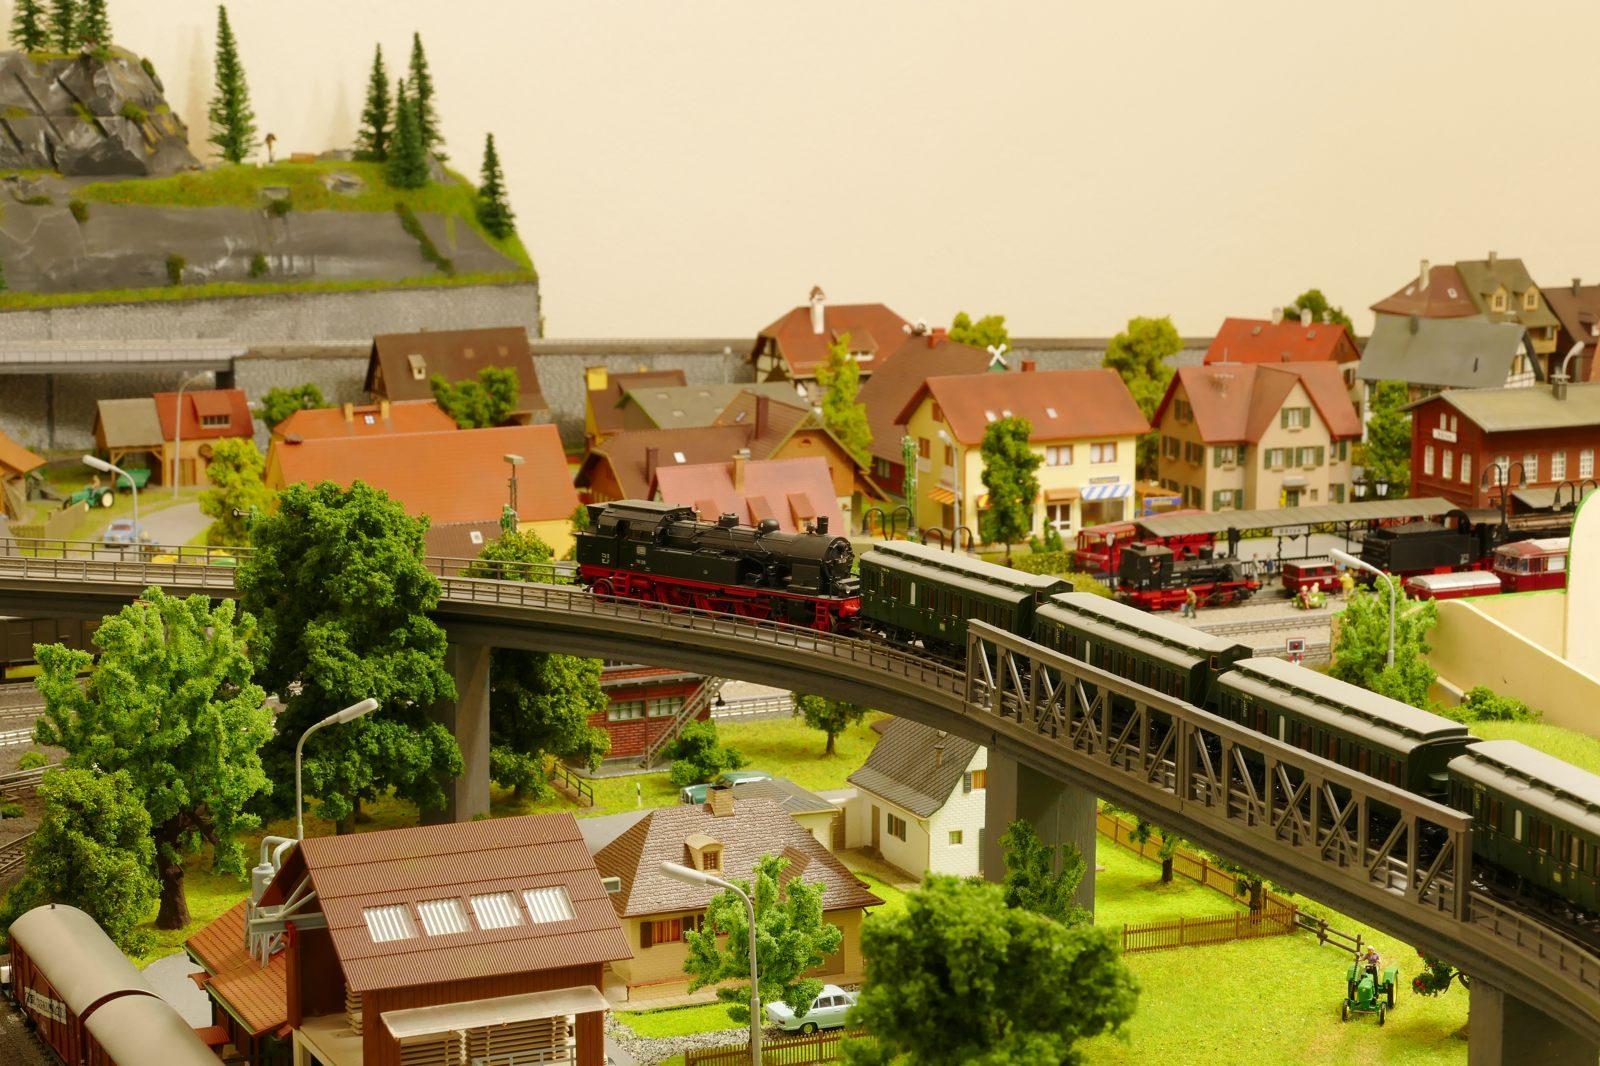 Die Brückenkonstruktion macht den Fahrbetrieb noch interessanter